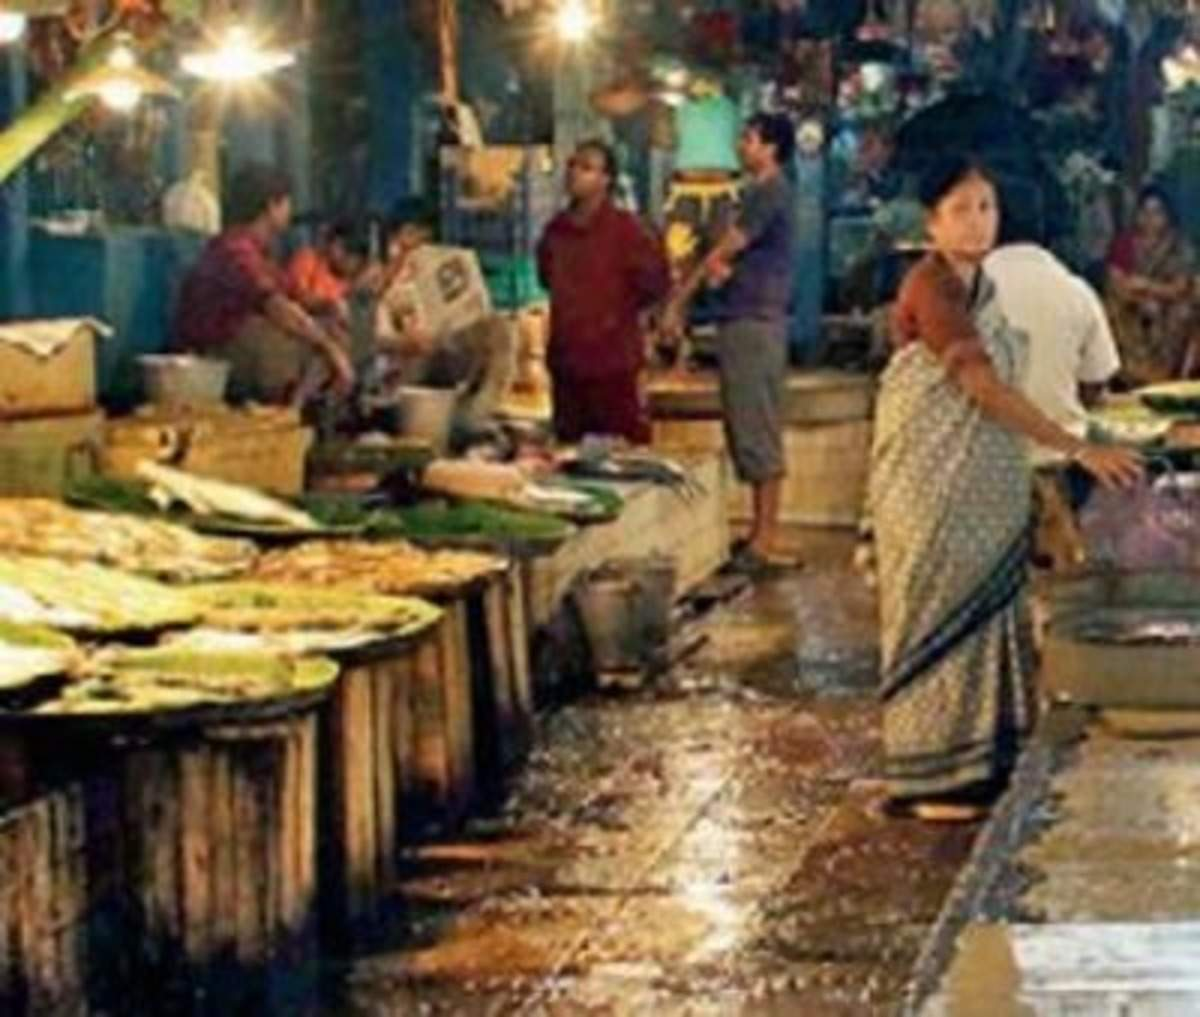 Kolkata's raw food is loaded with toxic lead: GSI study | Kolkata